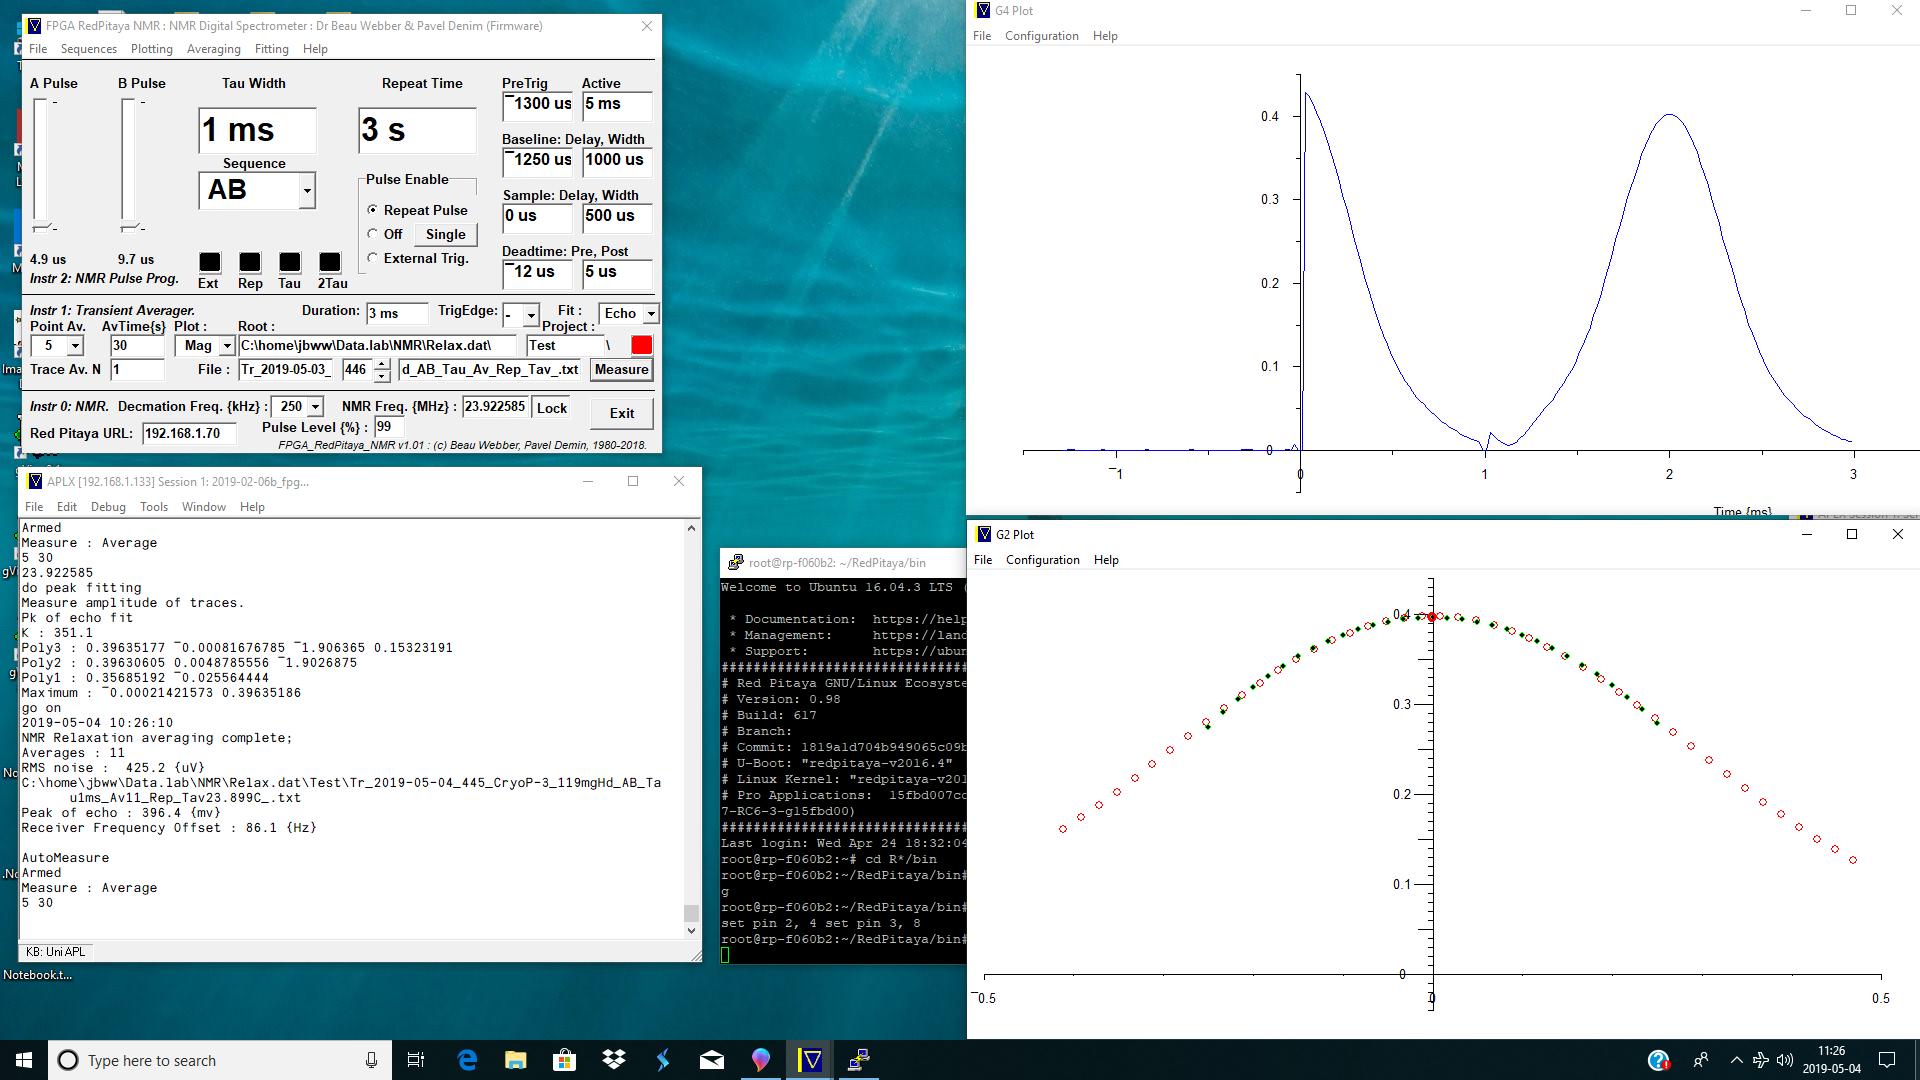 Lab Tools Instrumentation : Scientific Instrumentation and Software